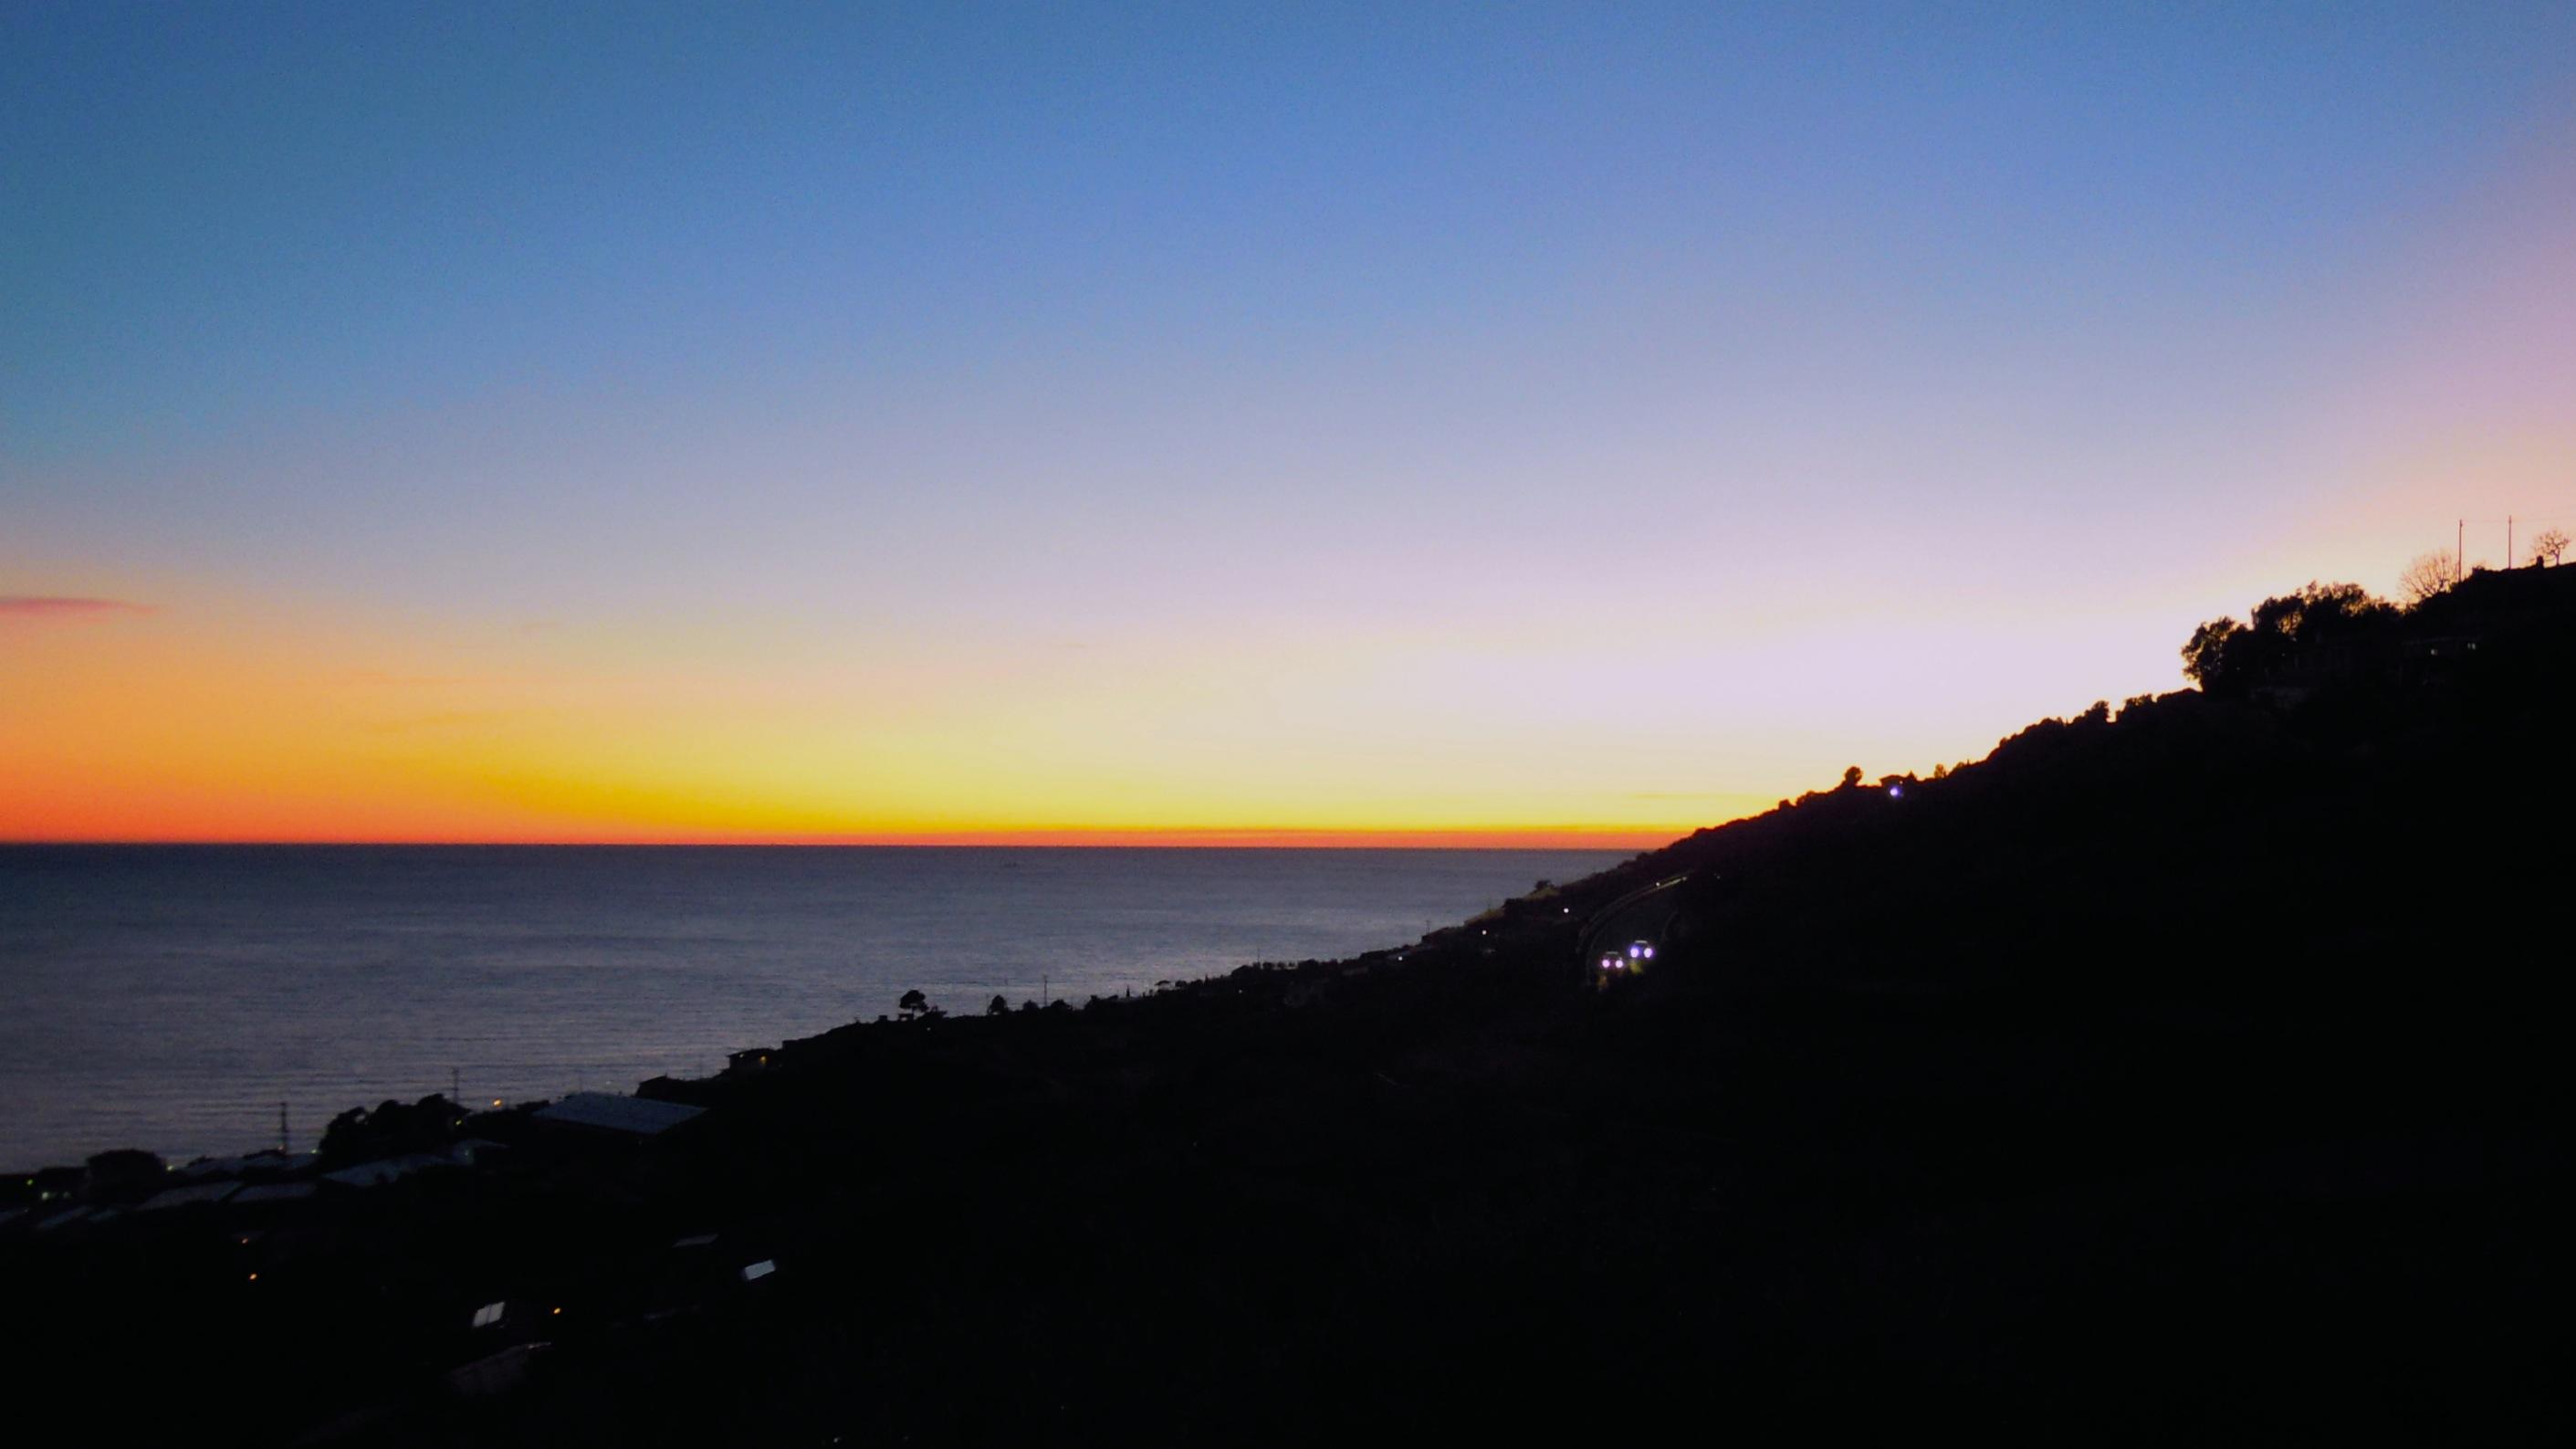 An Italian Sunset by Daria Meinardi